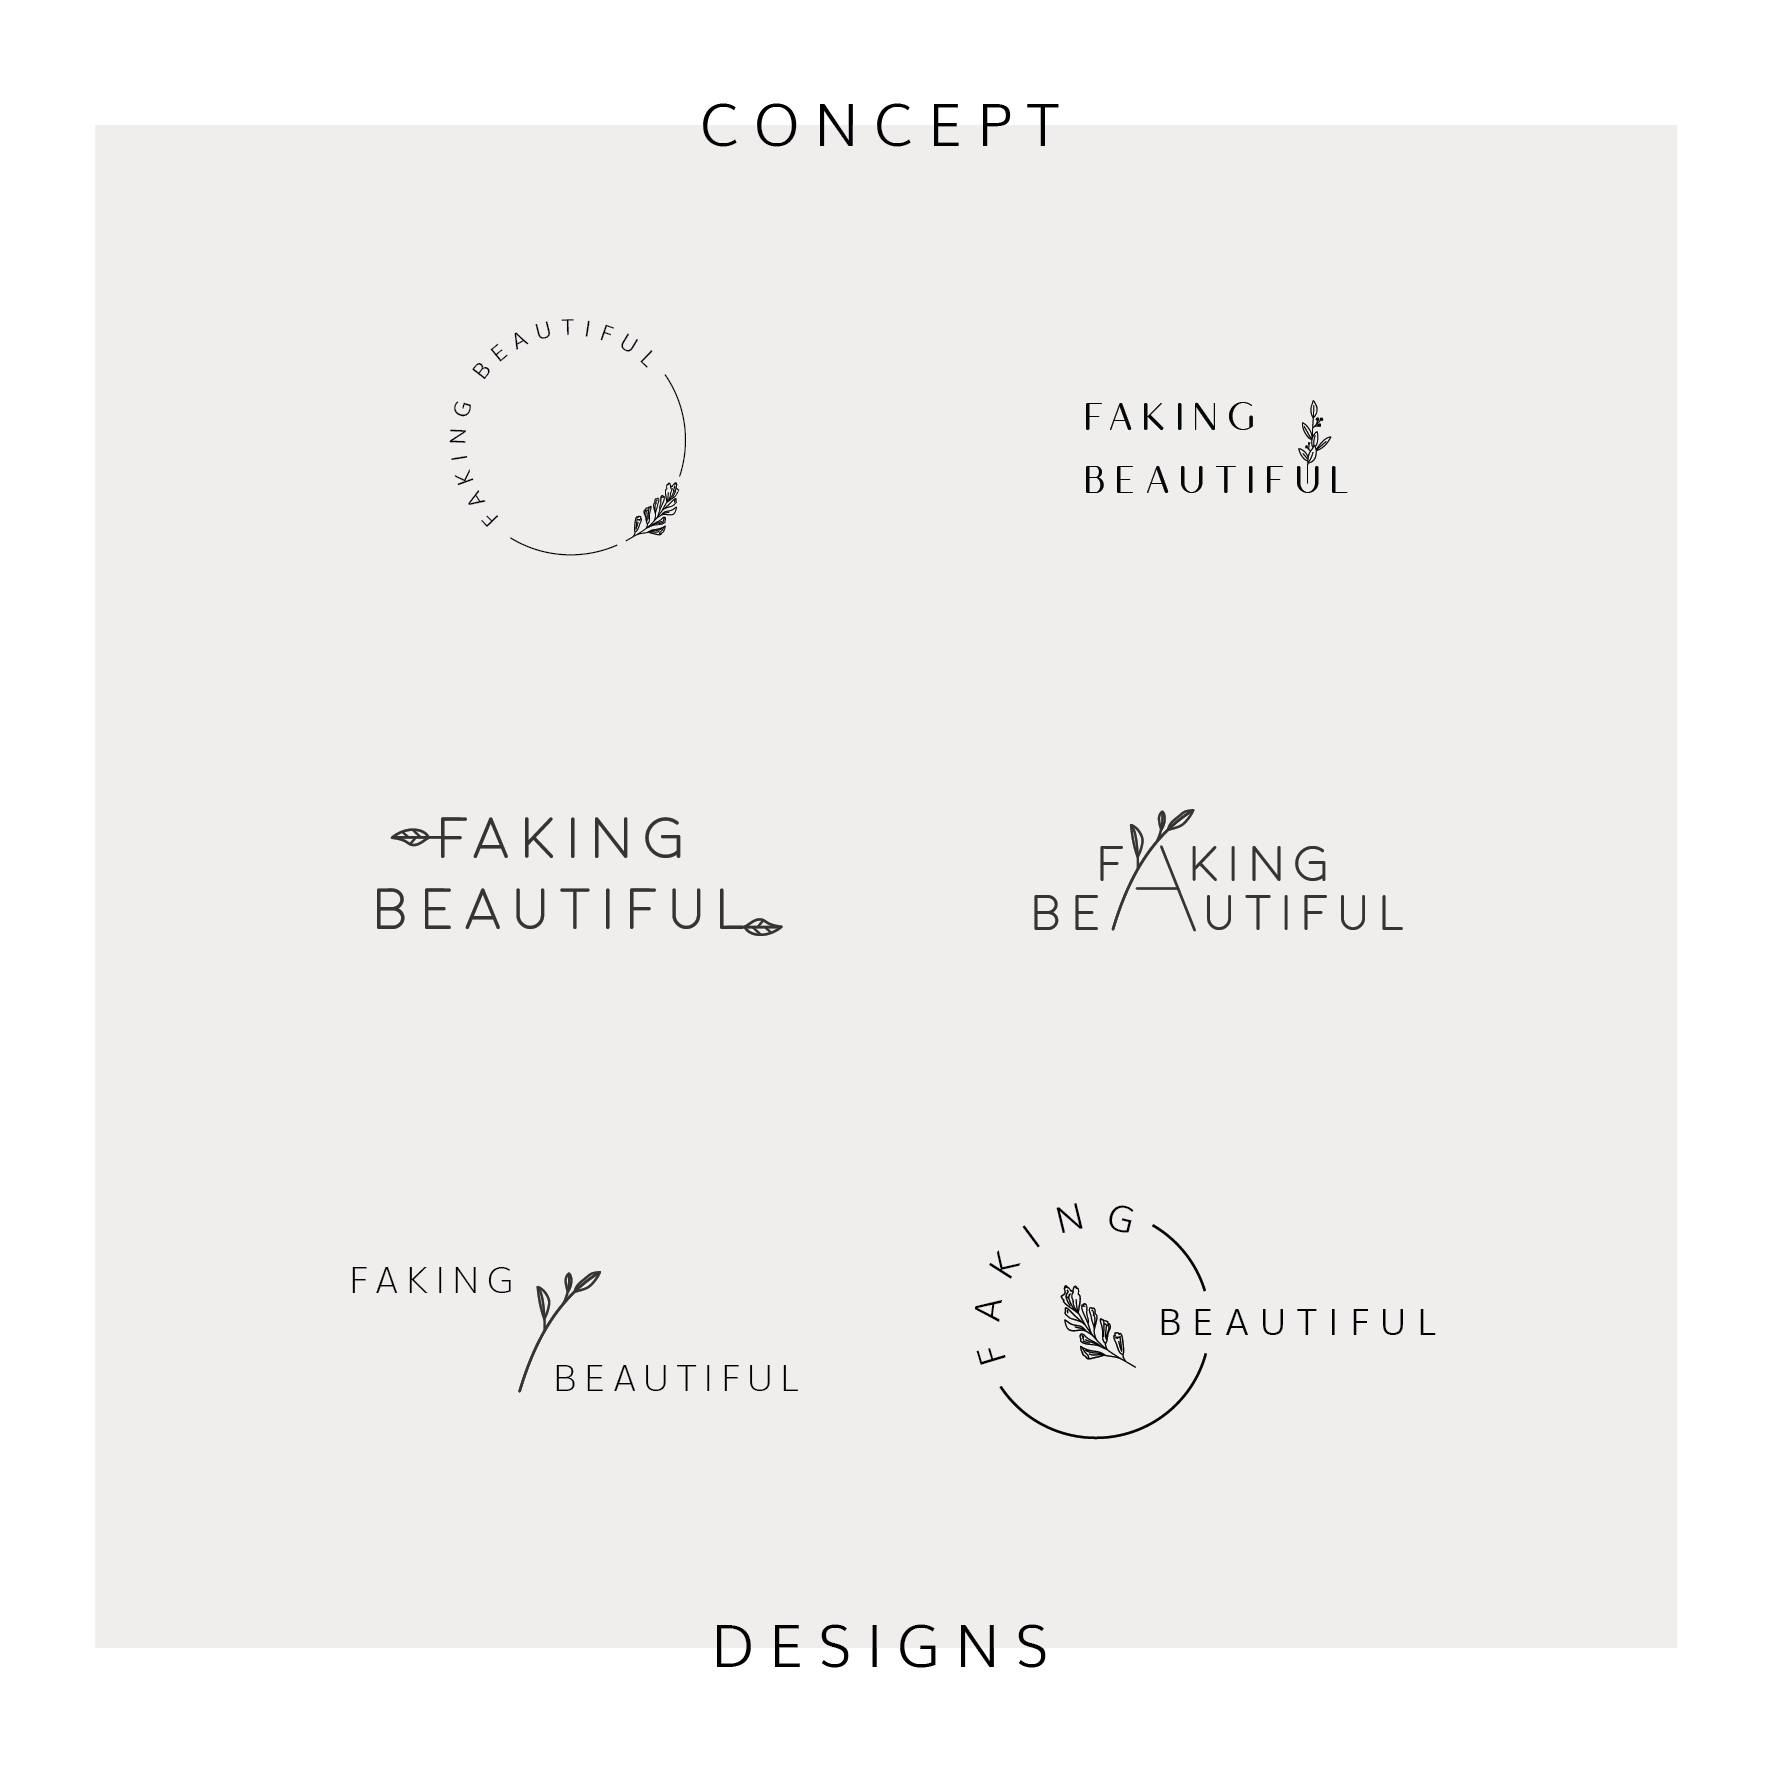 01 concepts-10.png